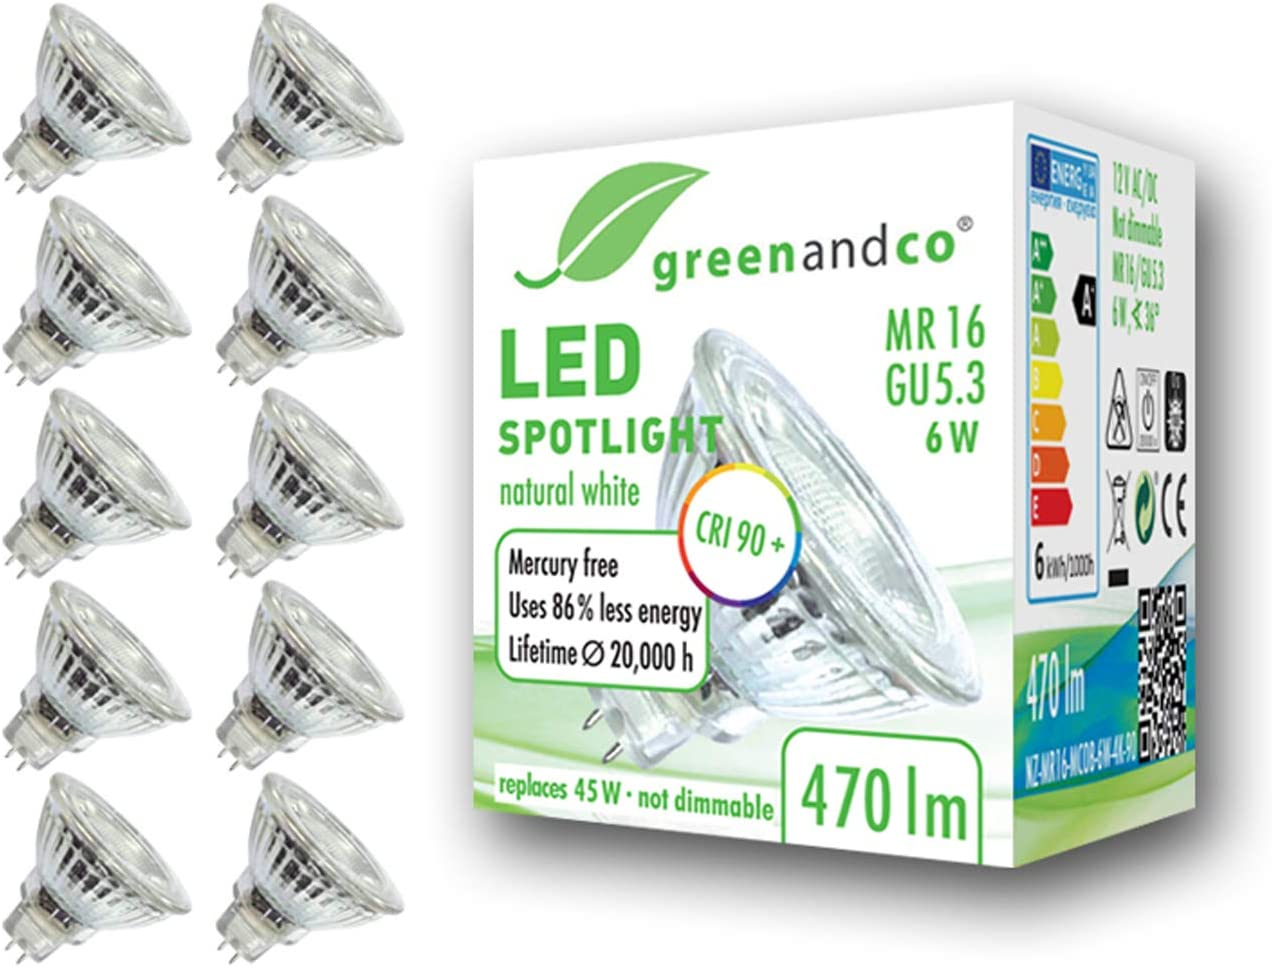 10x Spot LED greenandco® IRC 90+ 4000K 36° GU5.3 MR16 6W (corresponde a 45W) 470lm SMD LED 12V AC/DC, no regulable